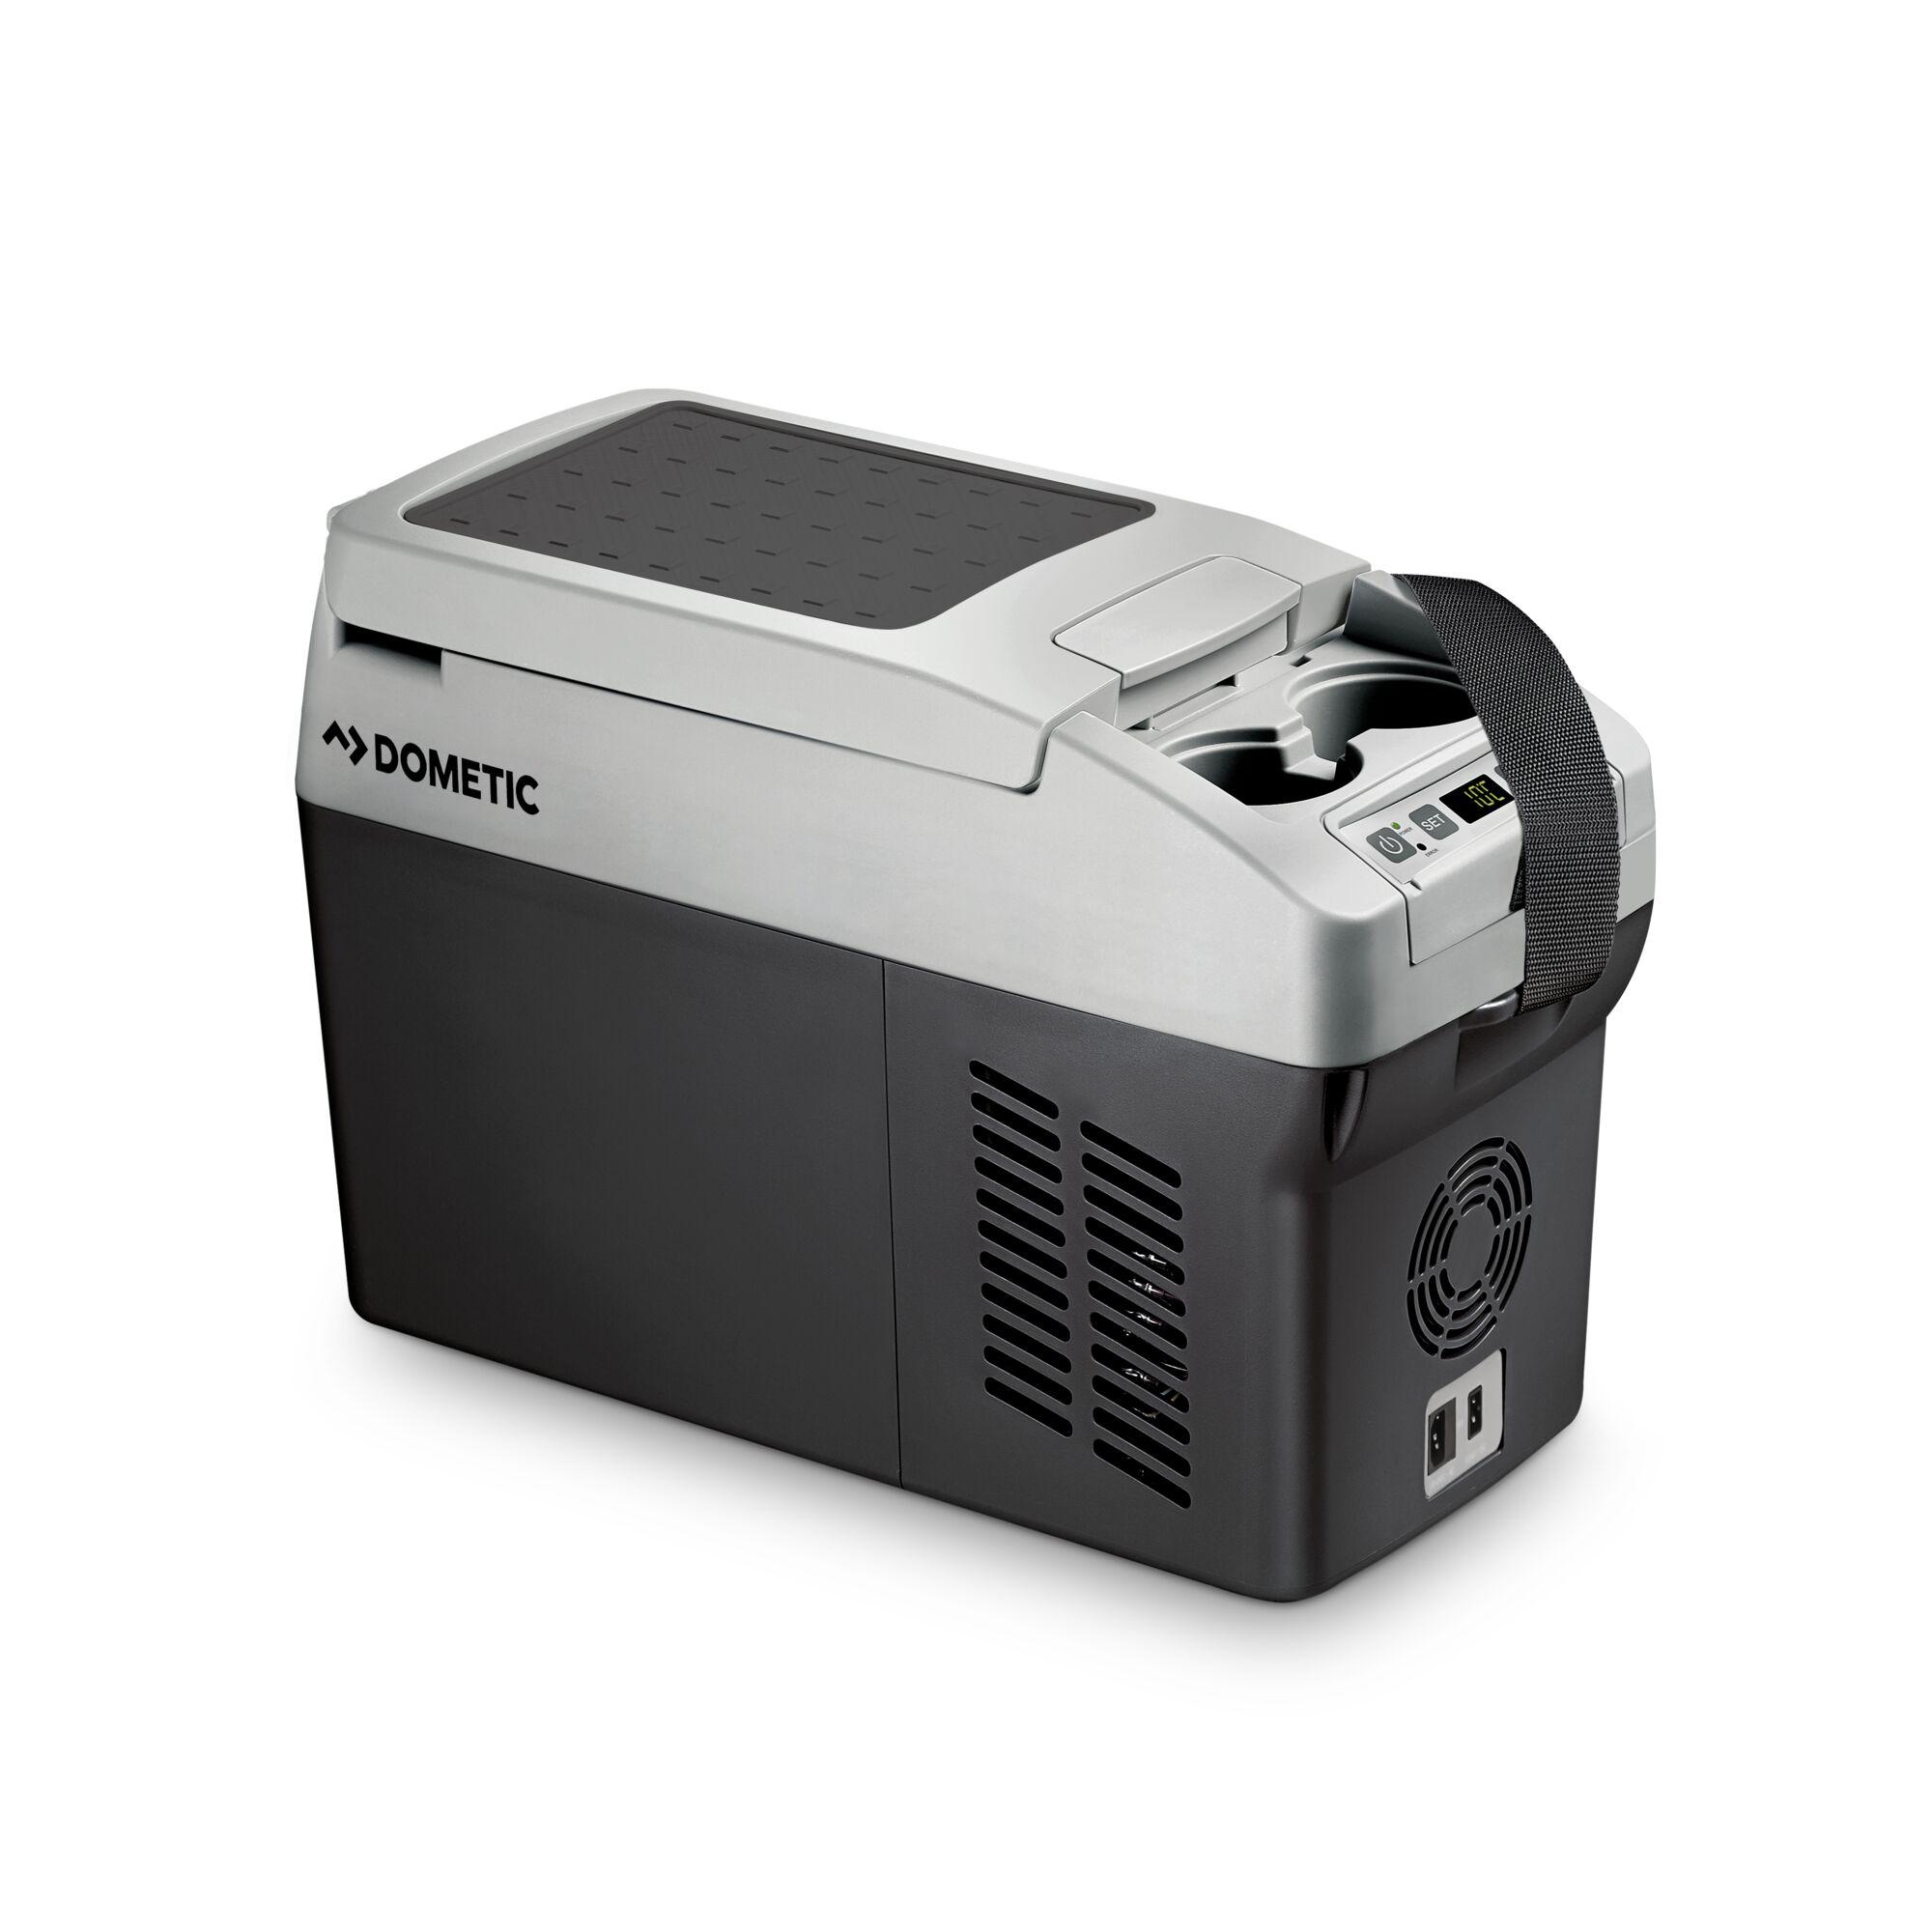 Dometic Waeco Kompressor Kühlbox CF-11 CoolFreeze 12/24 Volt Kühltasche EEK A++